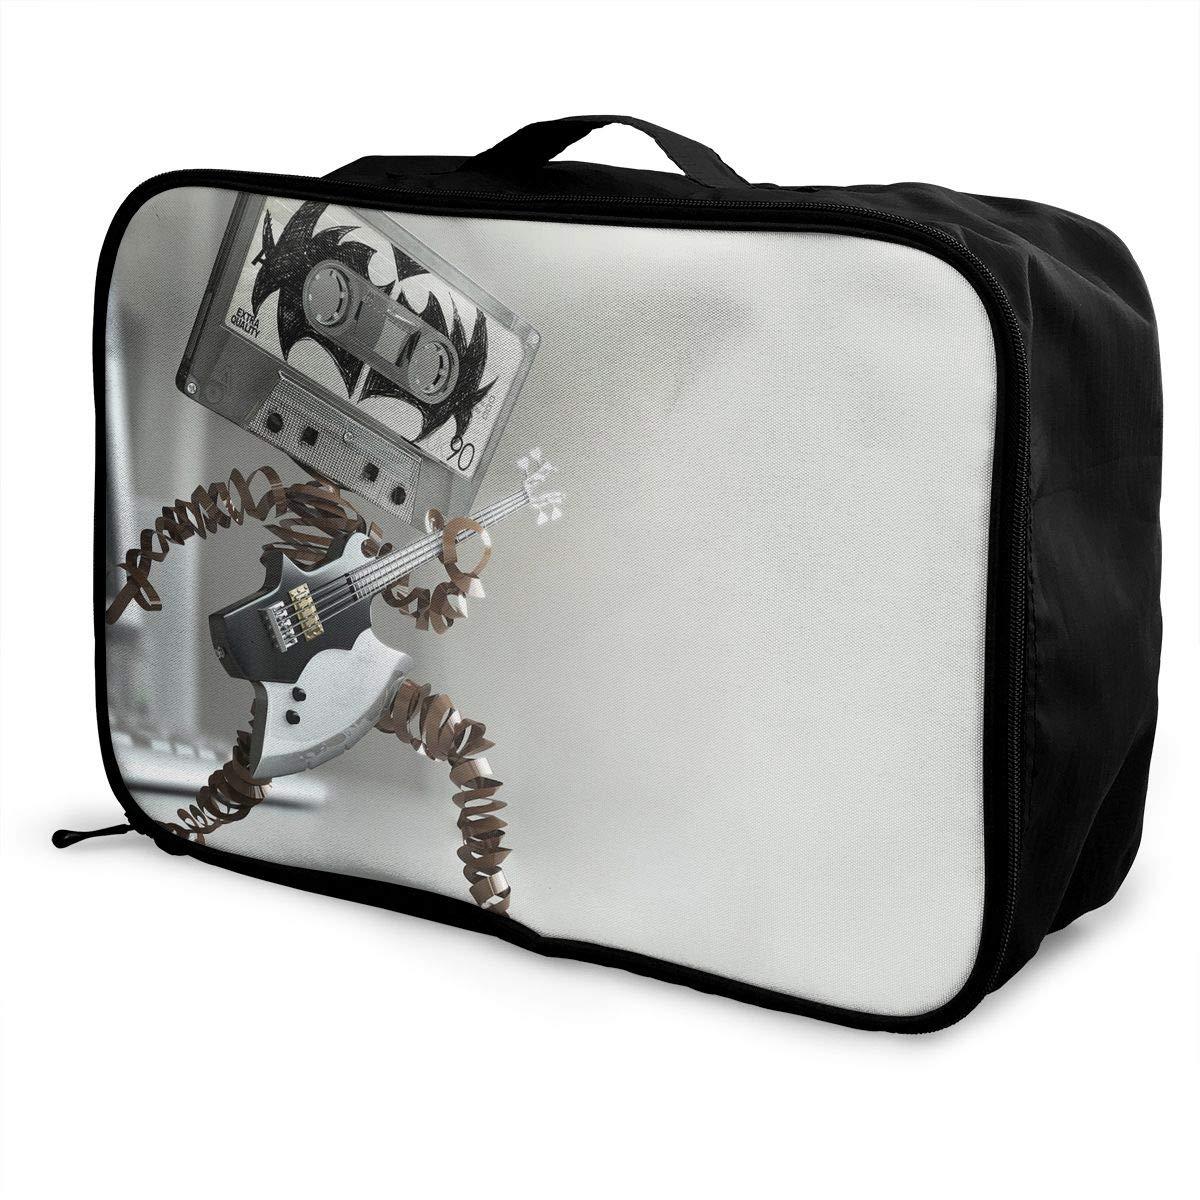 Travel Luggage Duffle Bag Lightweight Portable Handbag Cassette Rock Large Capacity Waterproof Foldable Storage Tote